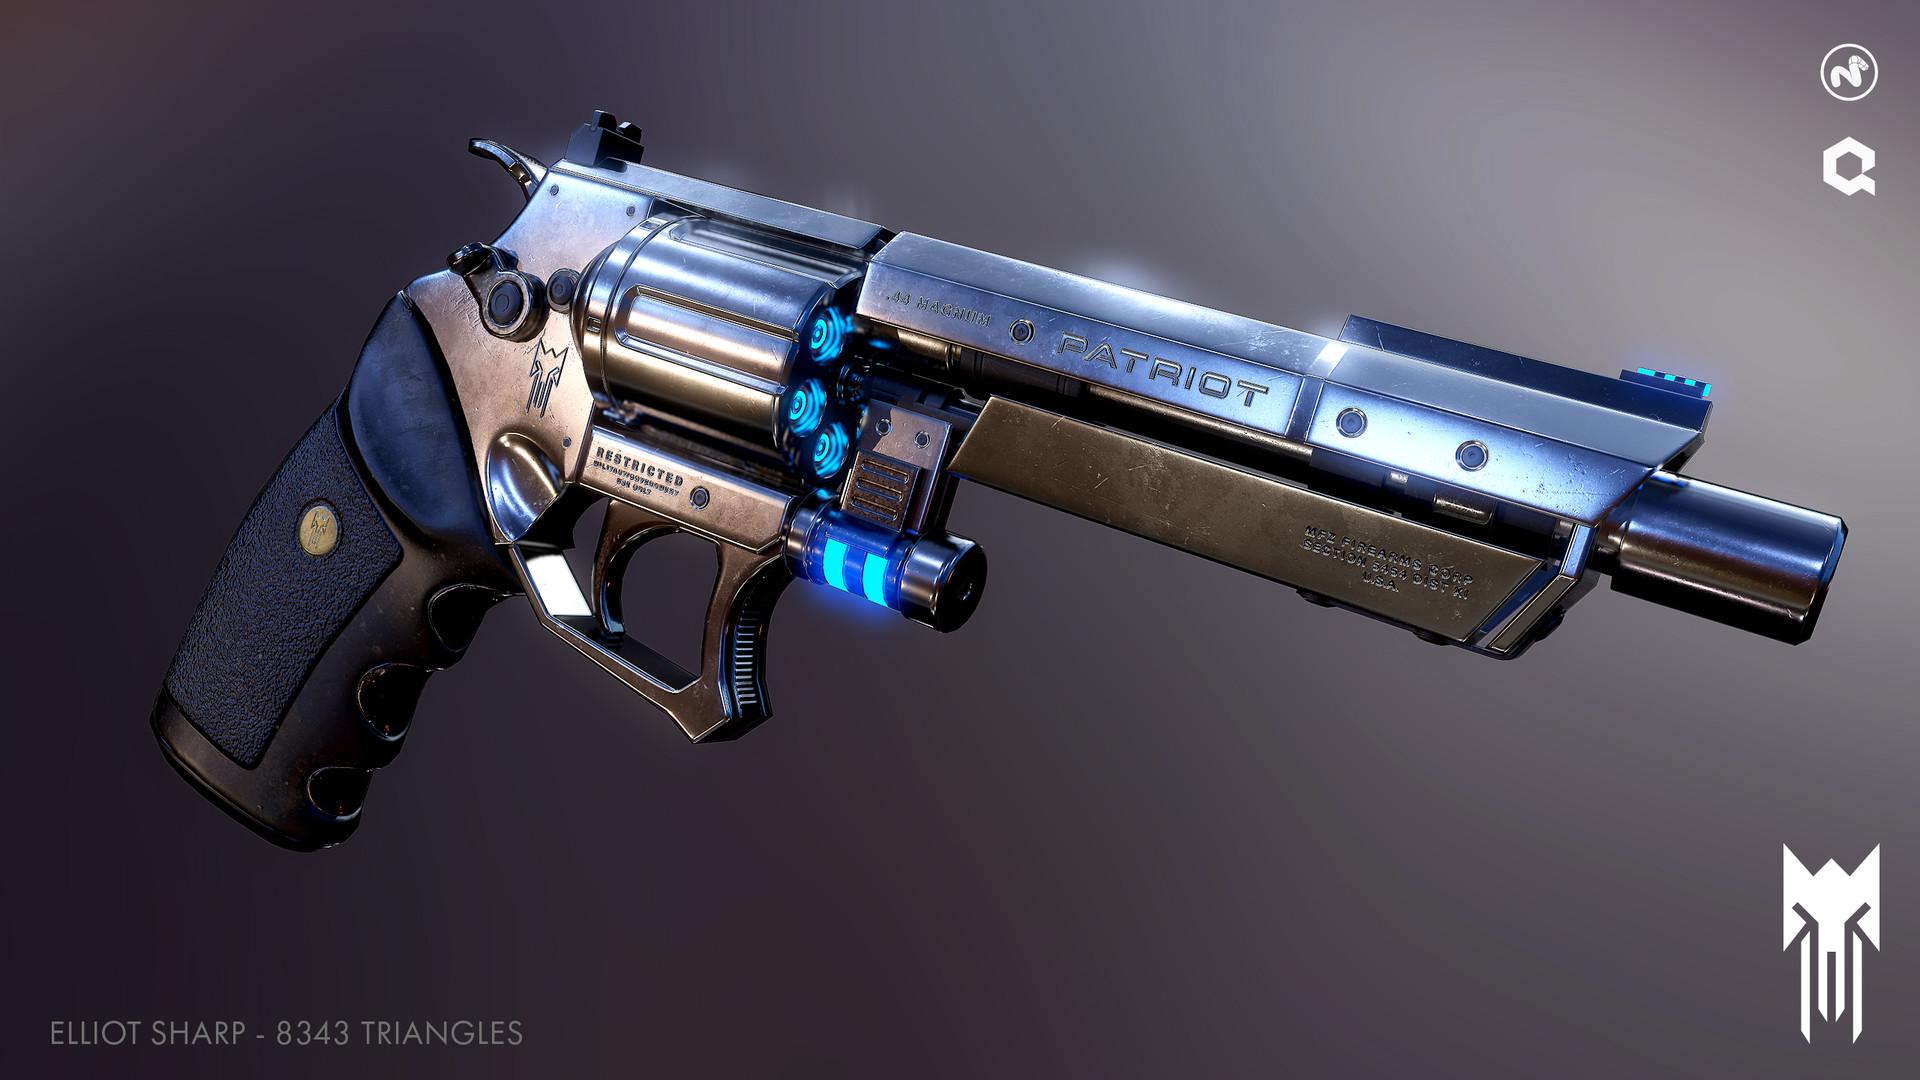 [Fiche] Kali 1494211958-elliot-sharp-elliotsharp-scifi-revolver-01